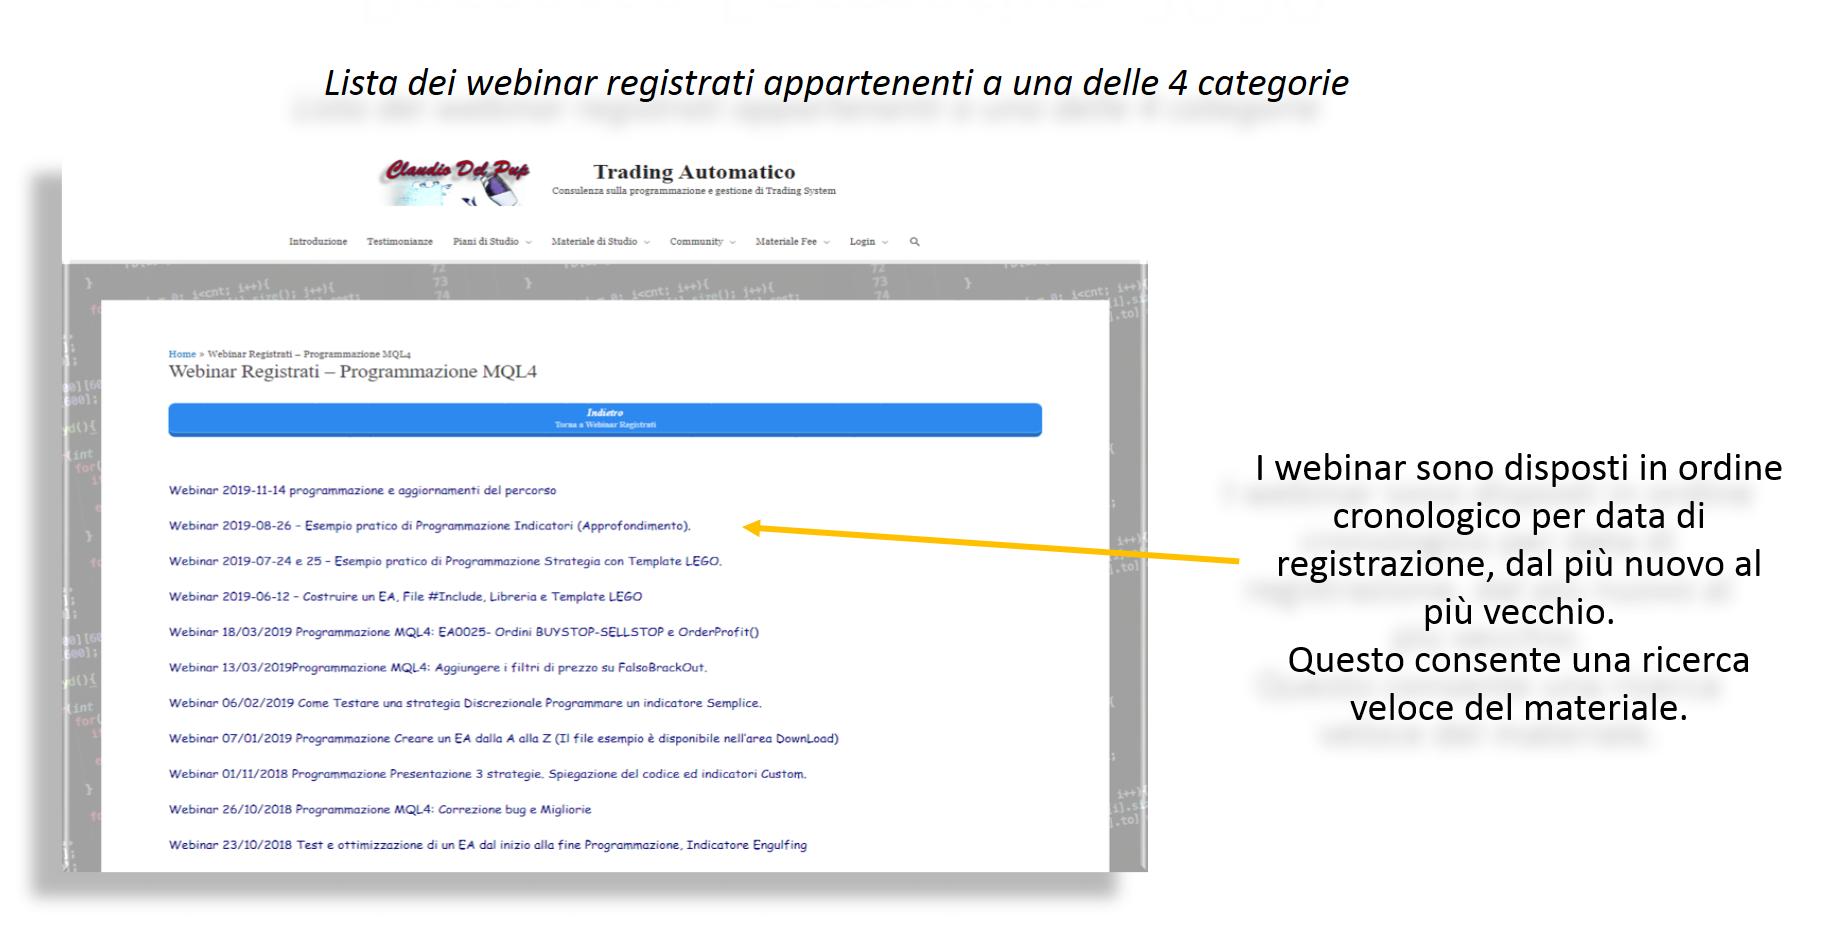 Lista Webinar Registrati